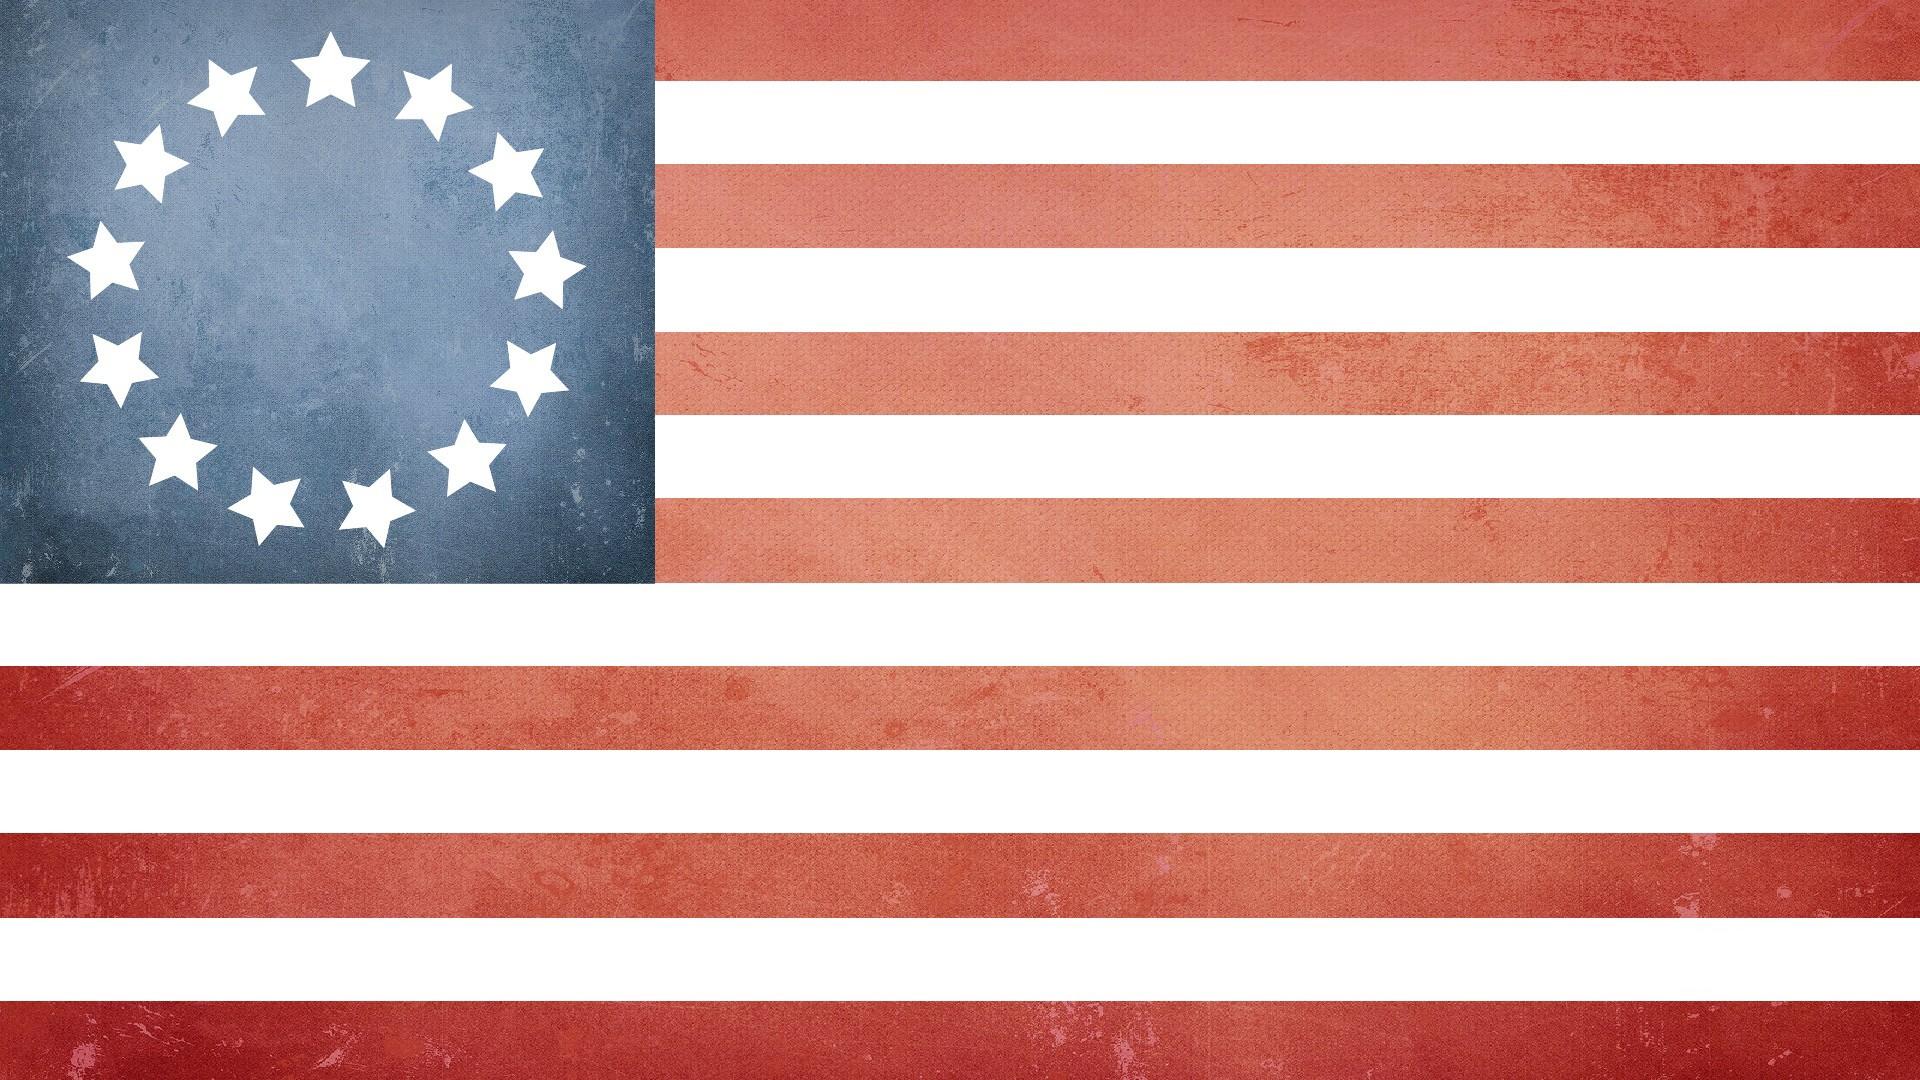 xpx America Flag Wallpaper